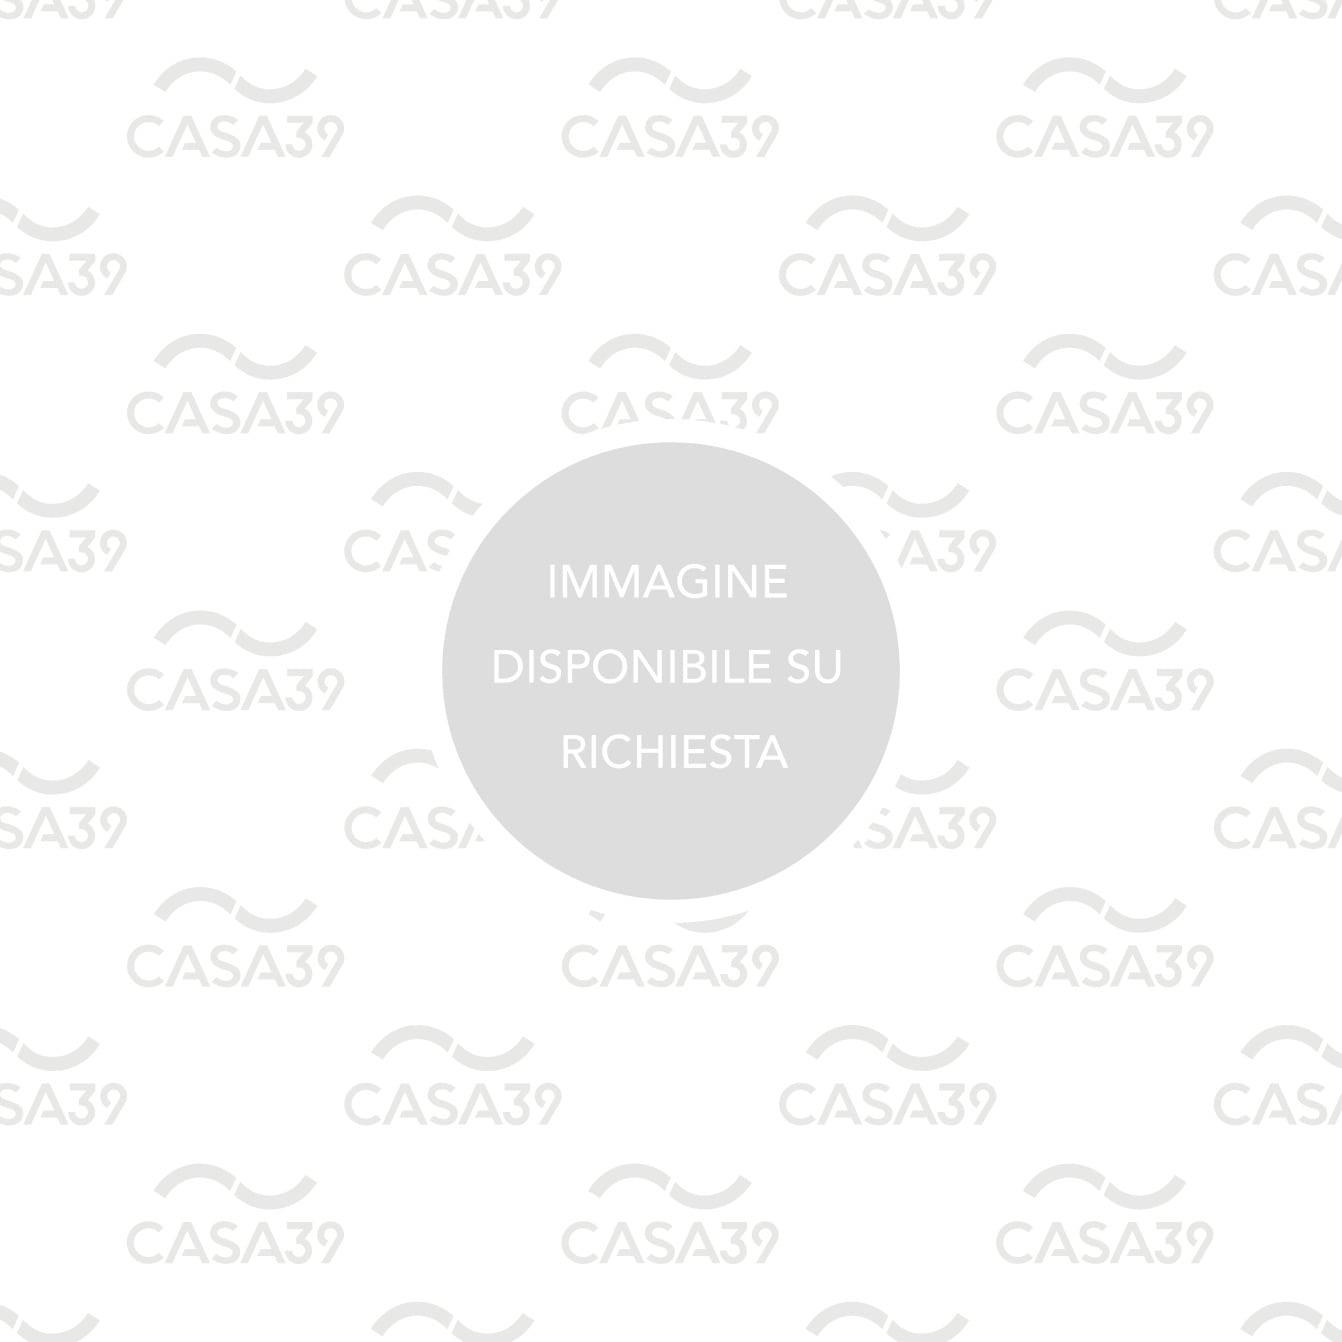 Emilceramica Chateau Mosaico Petite Mur Gris 30x30 cm EFTW | Casa39.de